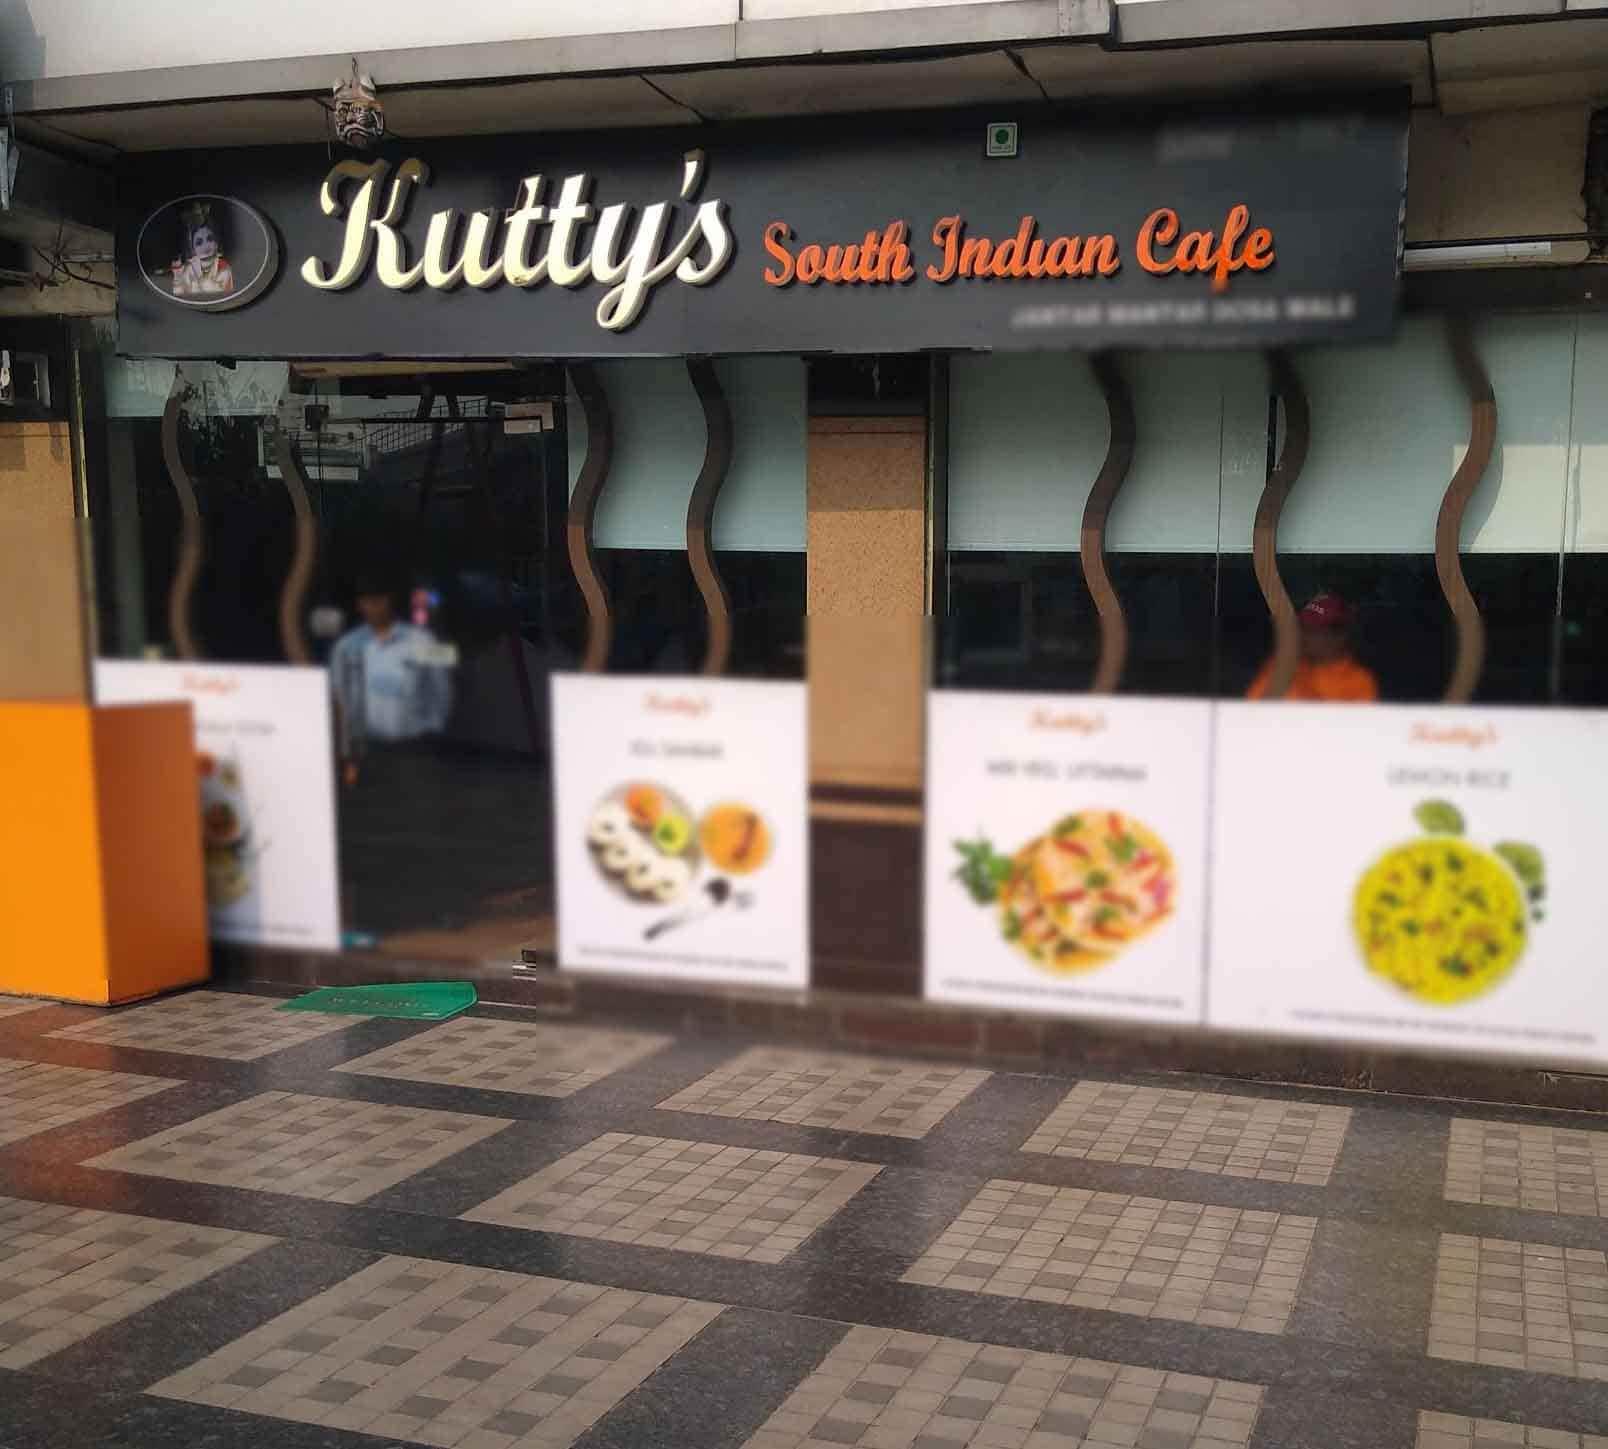 Kutty's South Indian Cafe - V3S Mall - Laxmi Nagar - Delhi NCR Image